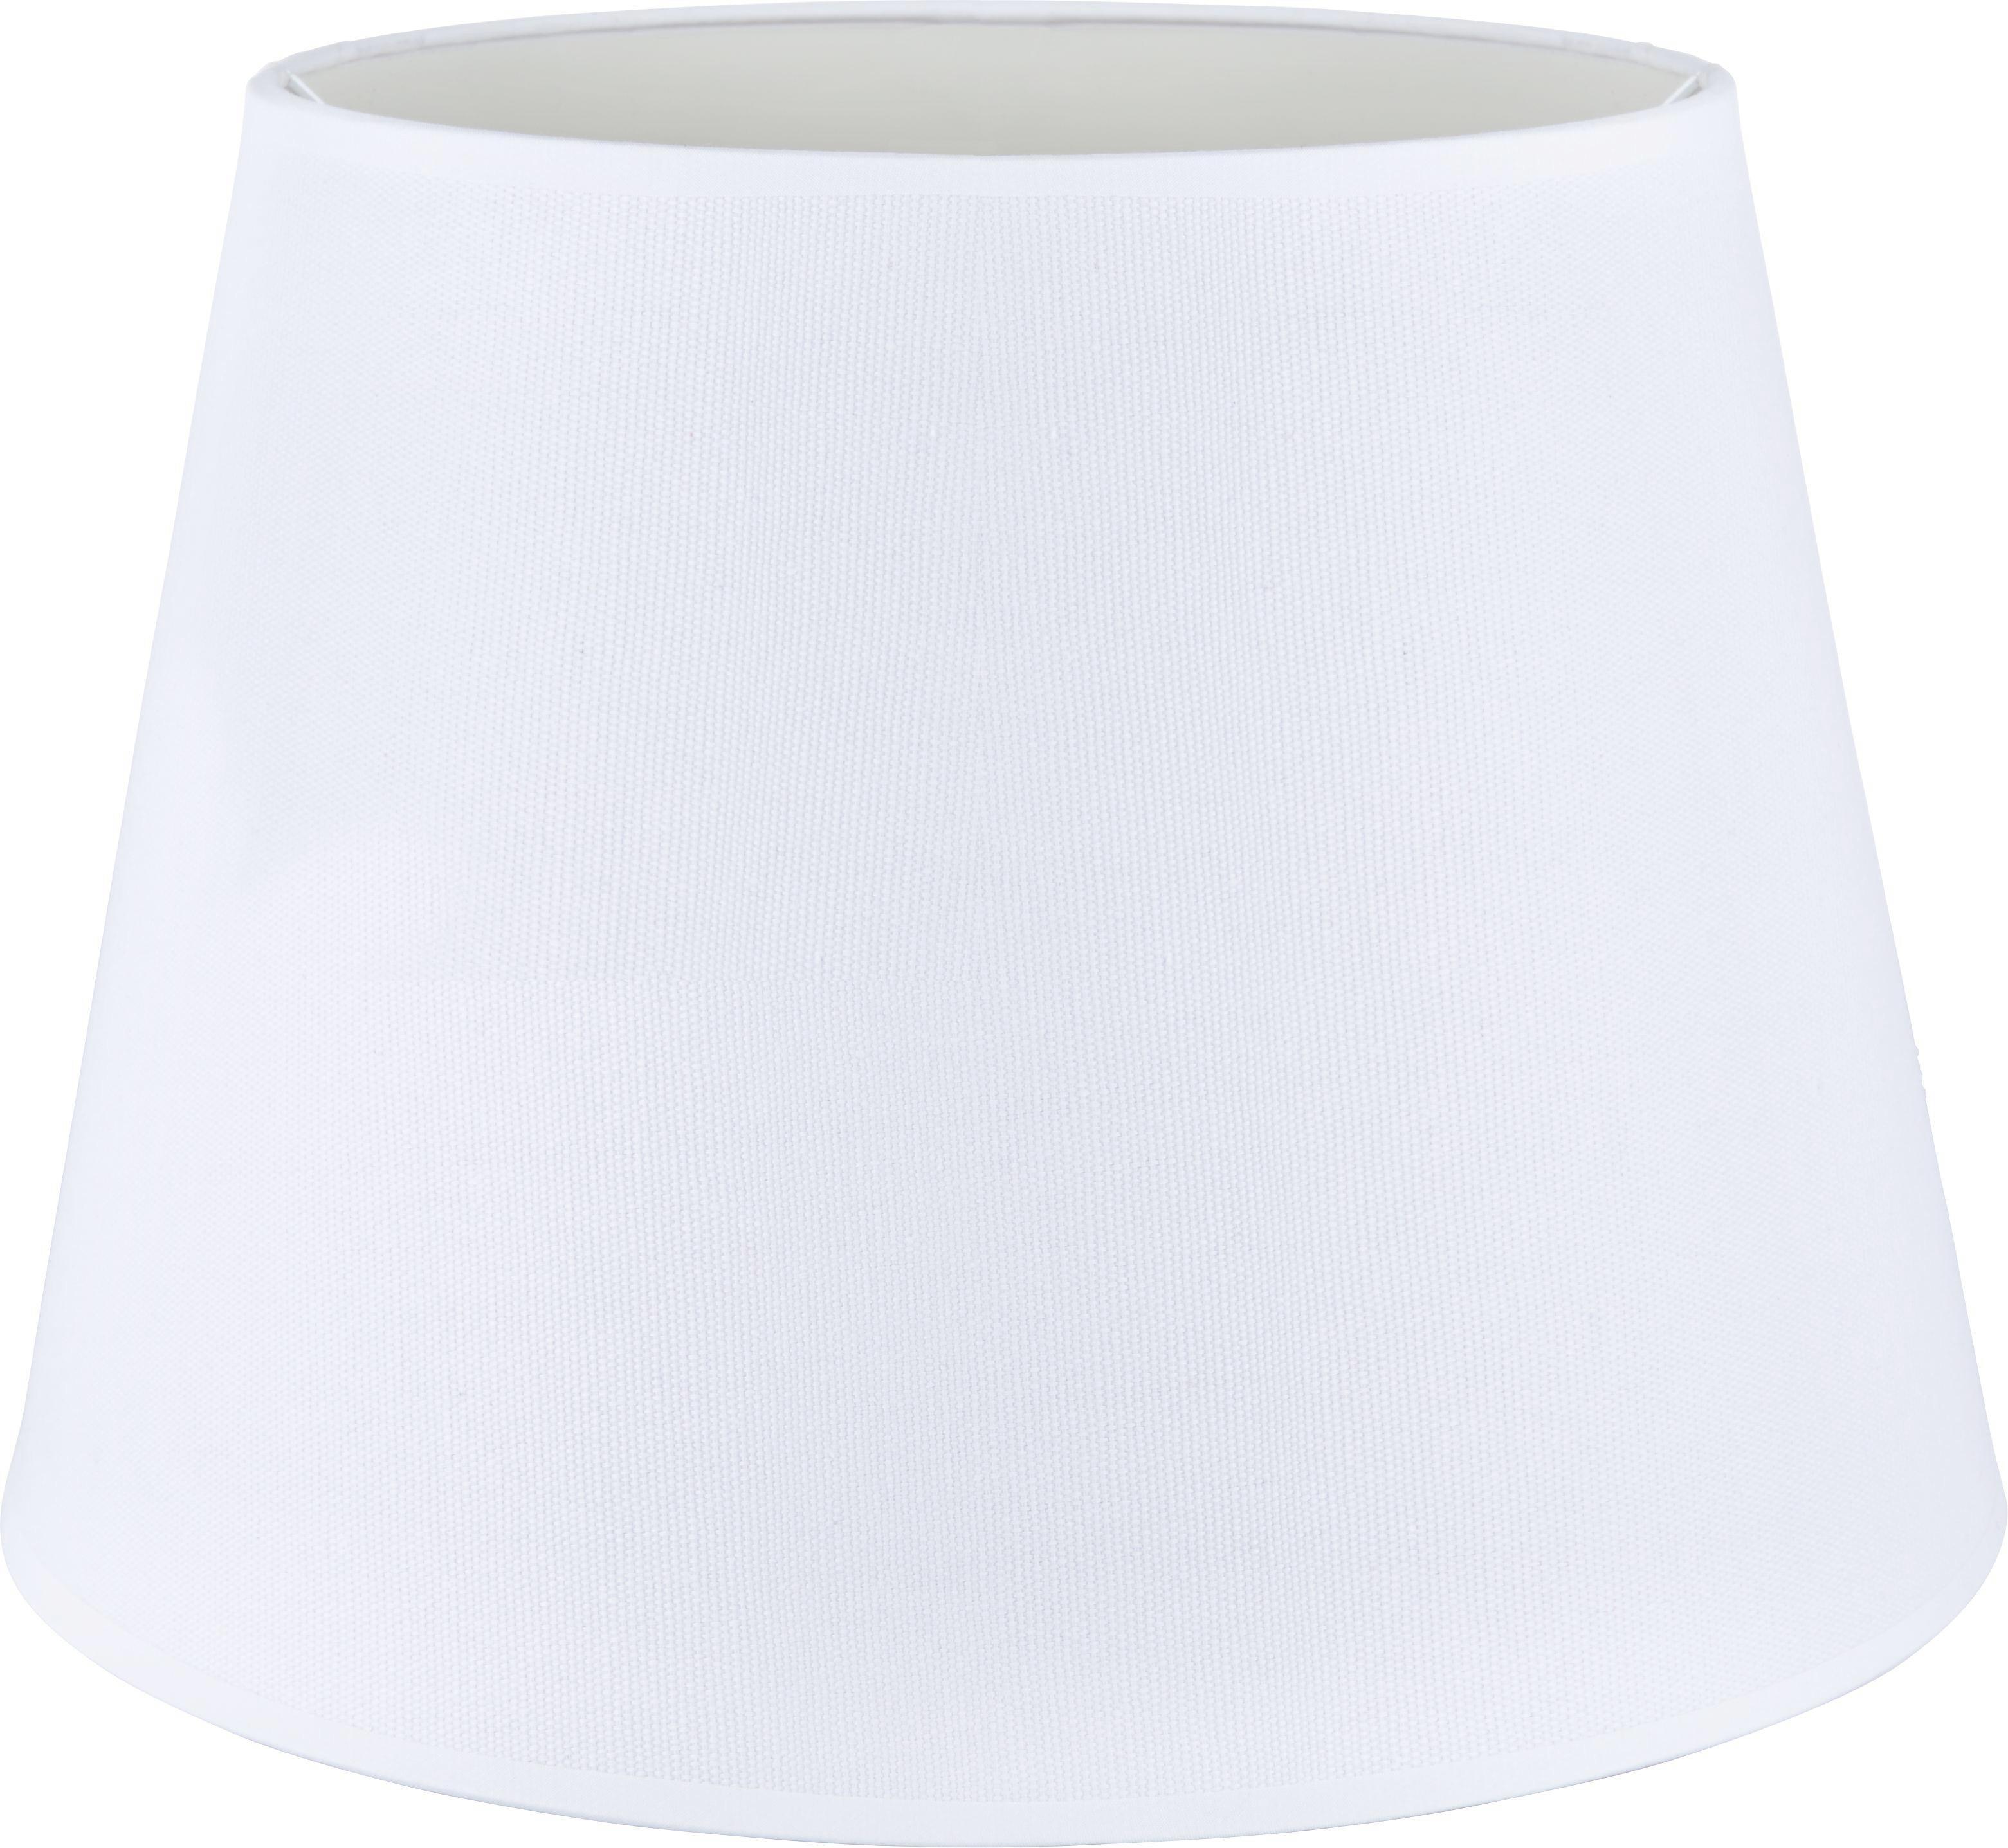 Stínítko Svítidla Selina - bílá, kov/textil (35/25cm) - MÖMAX modern living